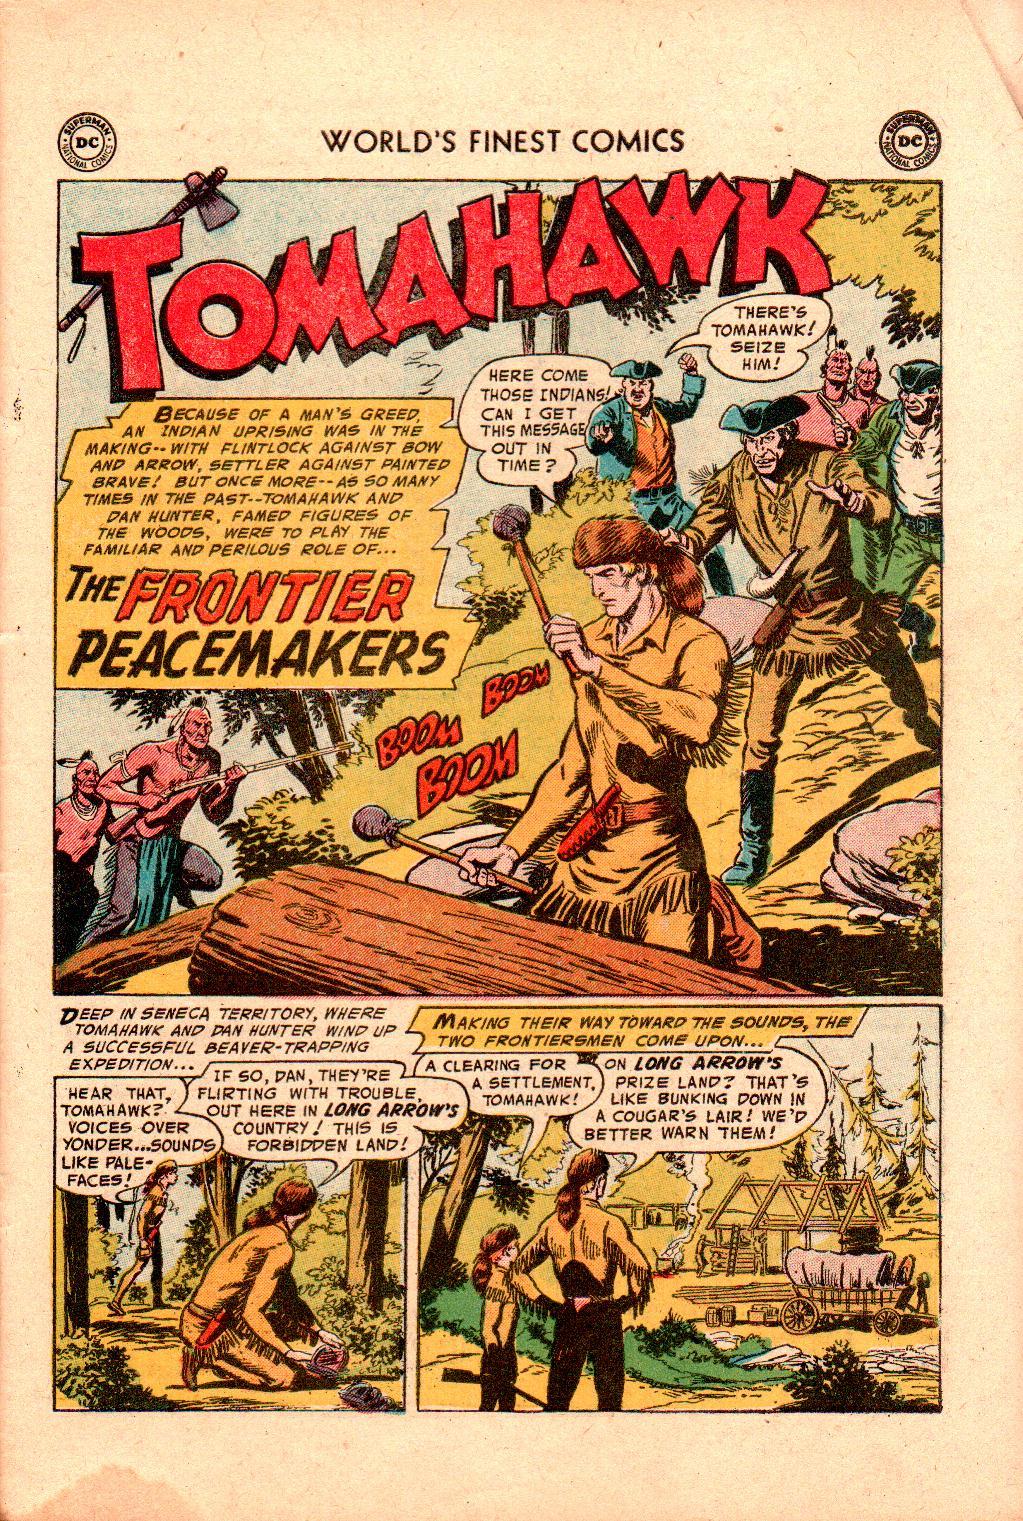 Read online World's Finest Comics comic -  Issue #78 - 27